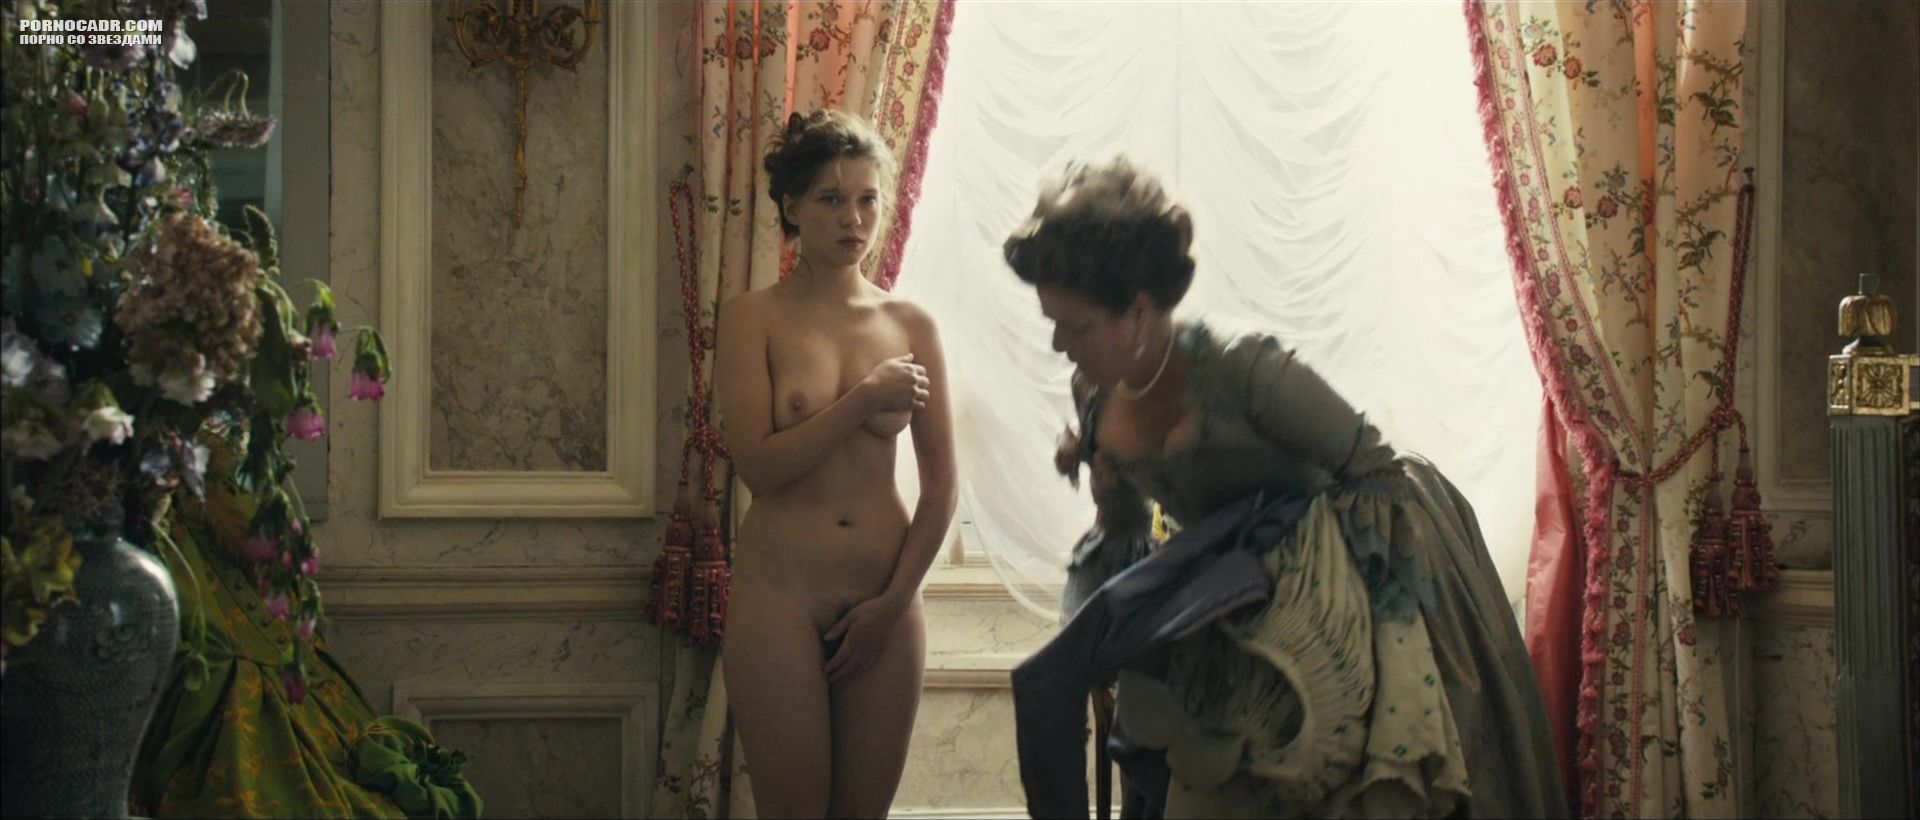 polina-agureeva-erotika-video-porno-retro-film-volosatih-bab